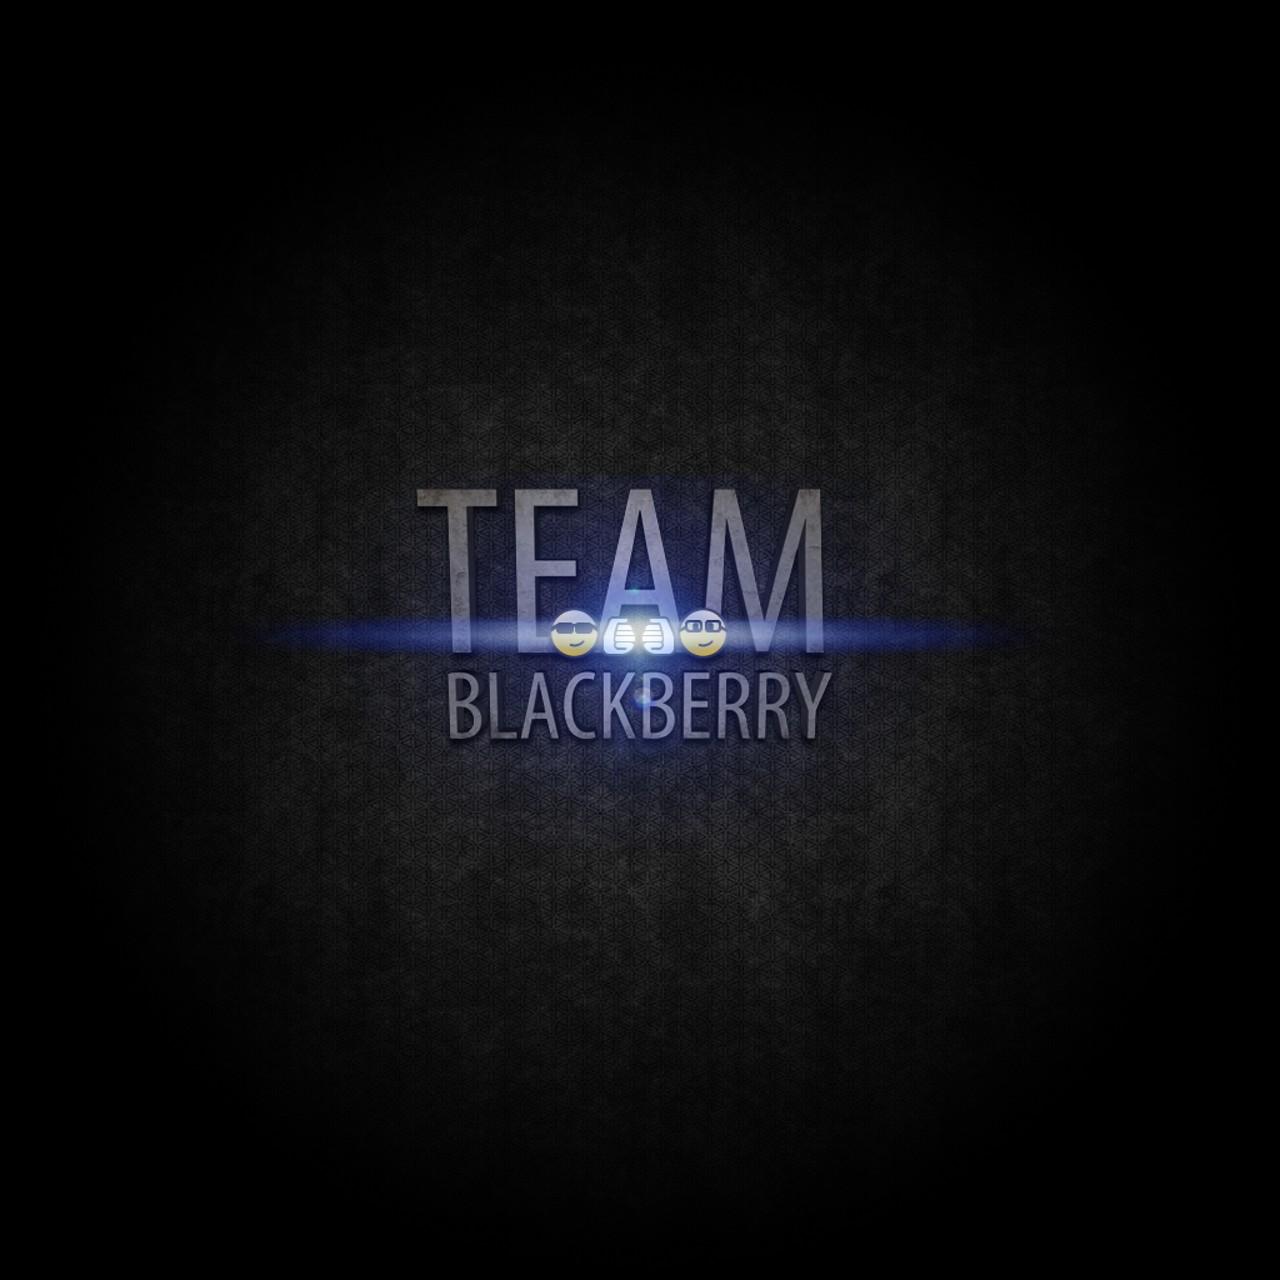 Cool Blackberry Wallpapers Hd: Cool BlackBerry Wallpapers